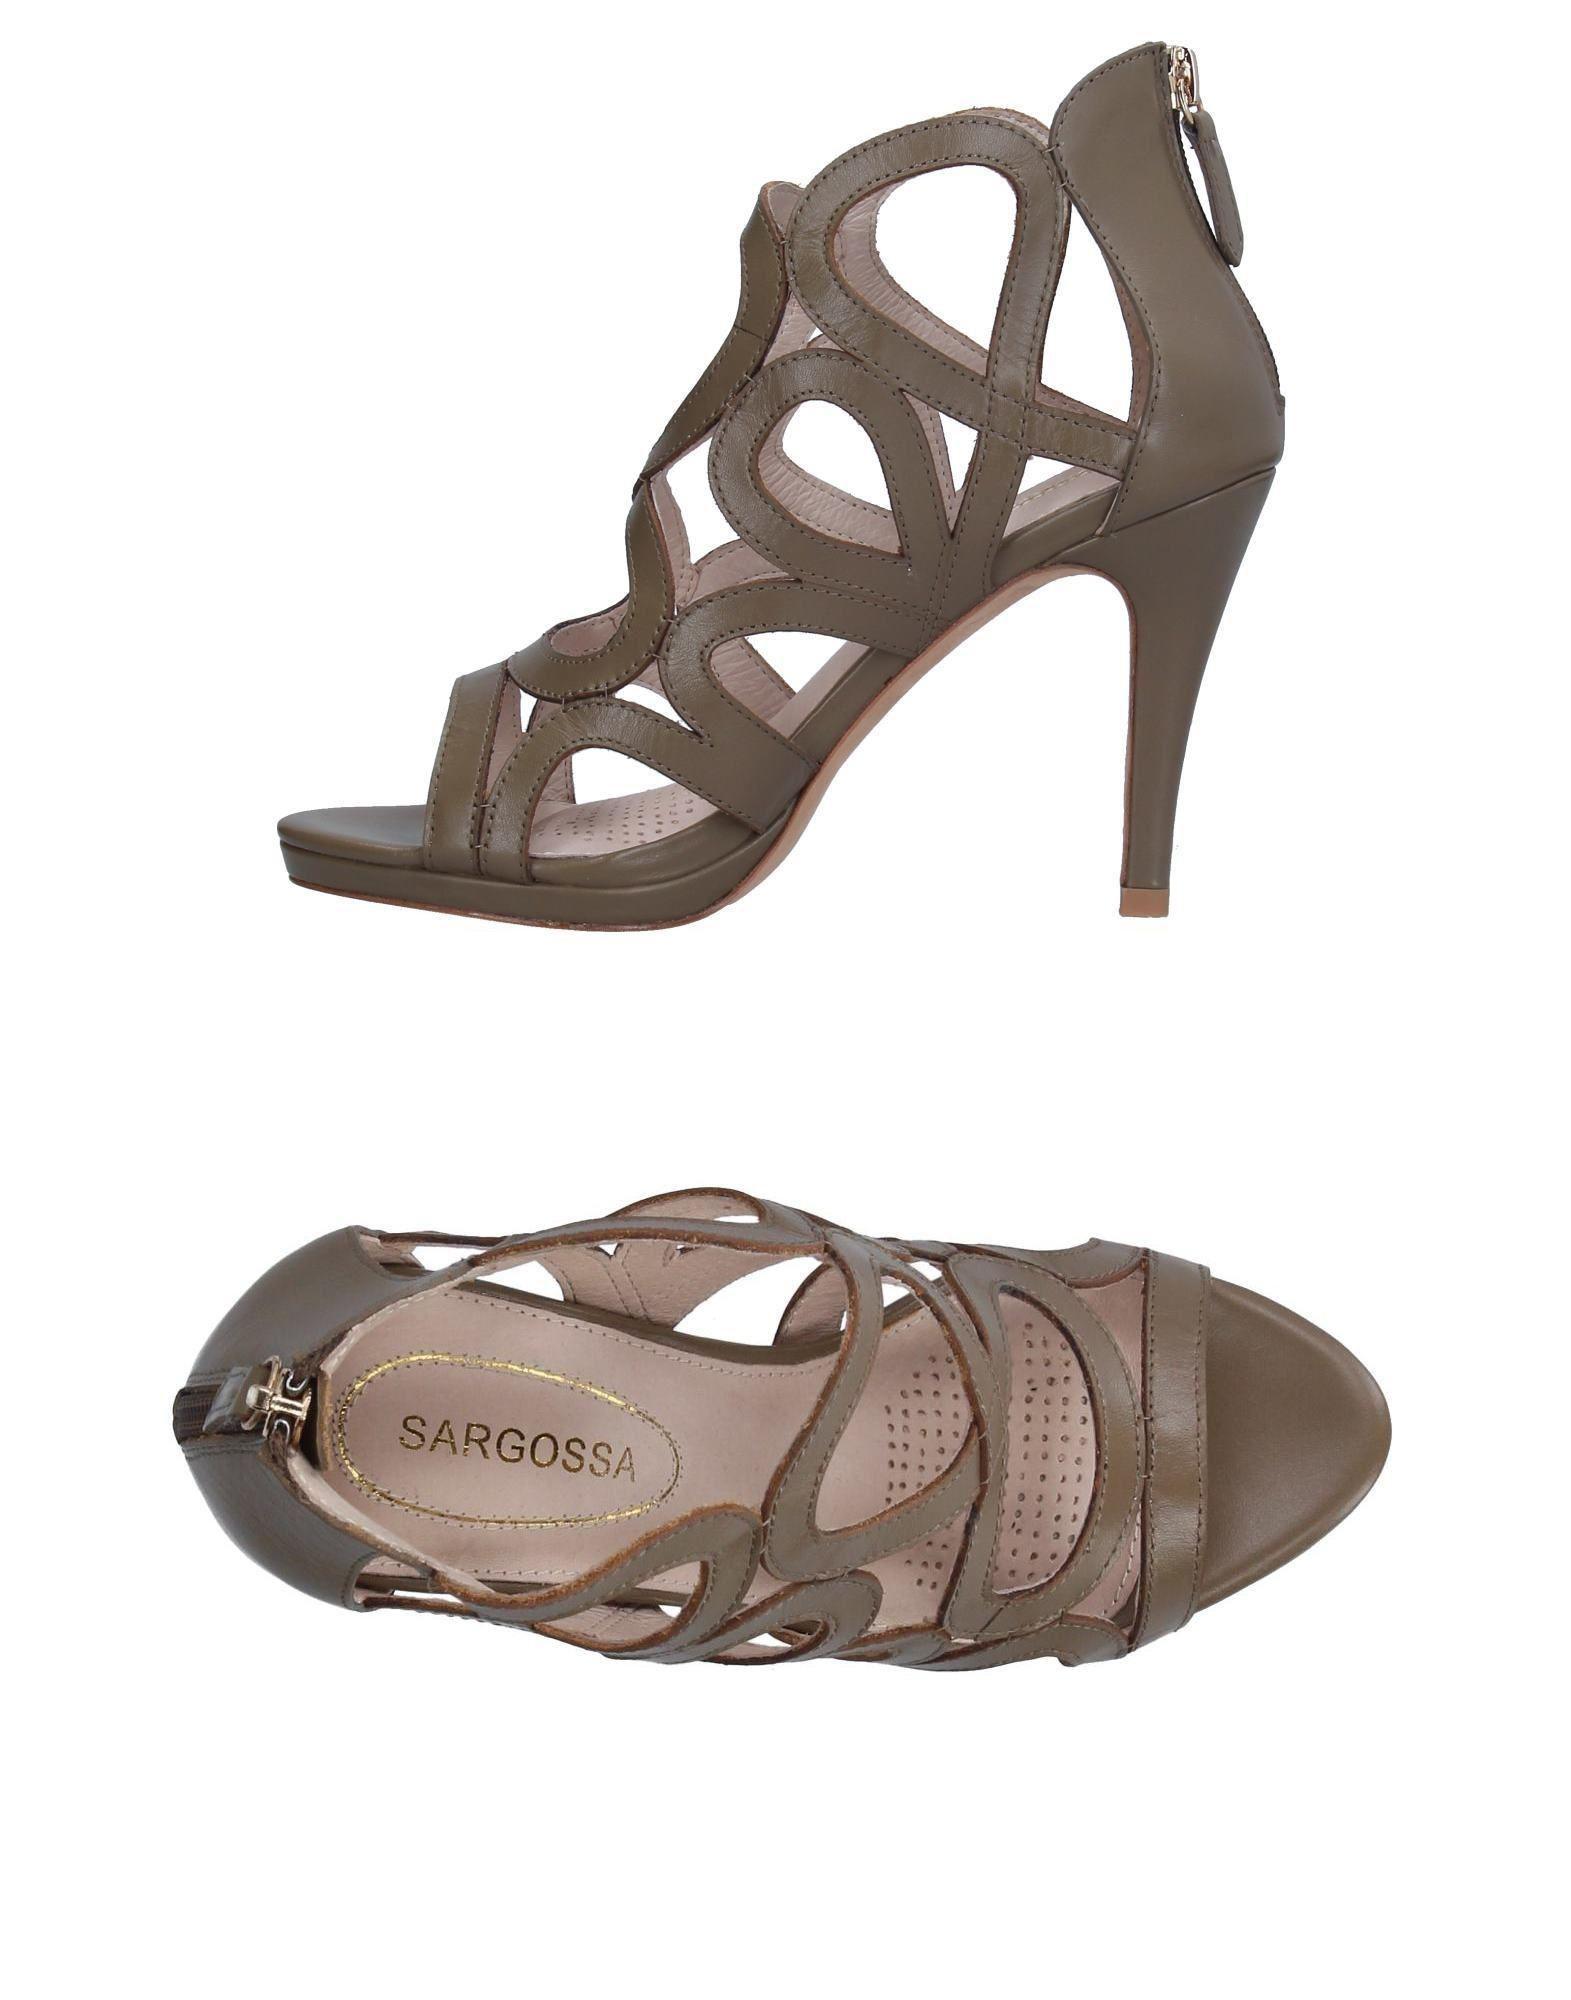 61b80e1196cb Sargossa Sandals - Lyst